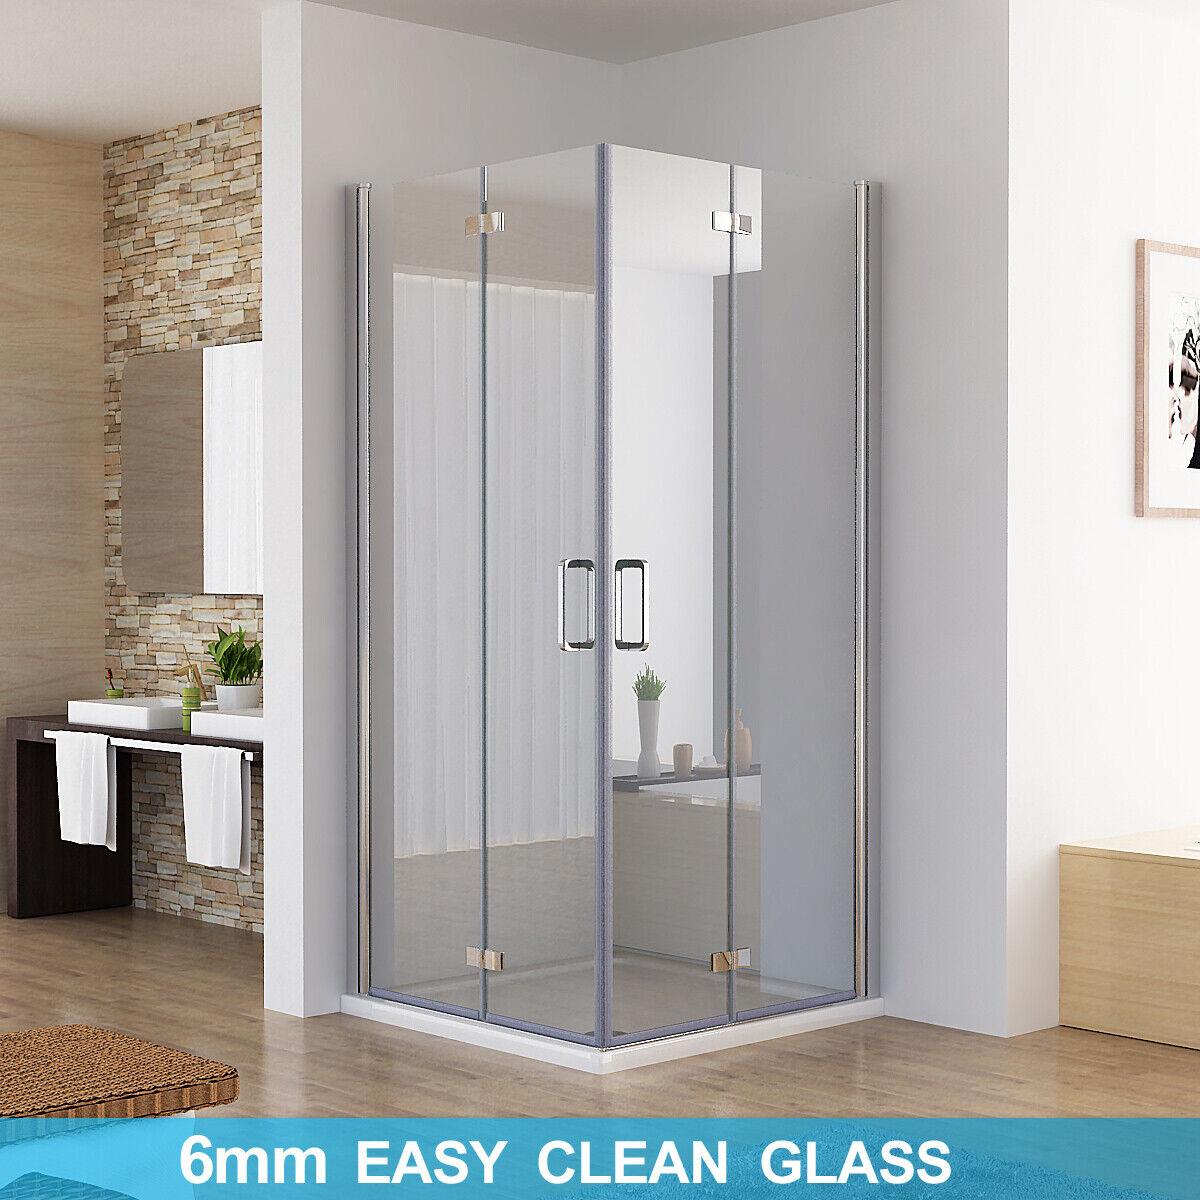 Shower Enclosure Corner Entry Bifold Door Frameless 6mm Nano Glass 1850mm